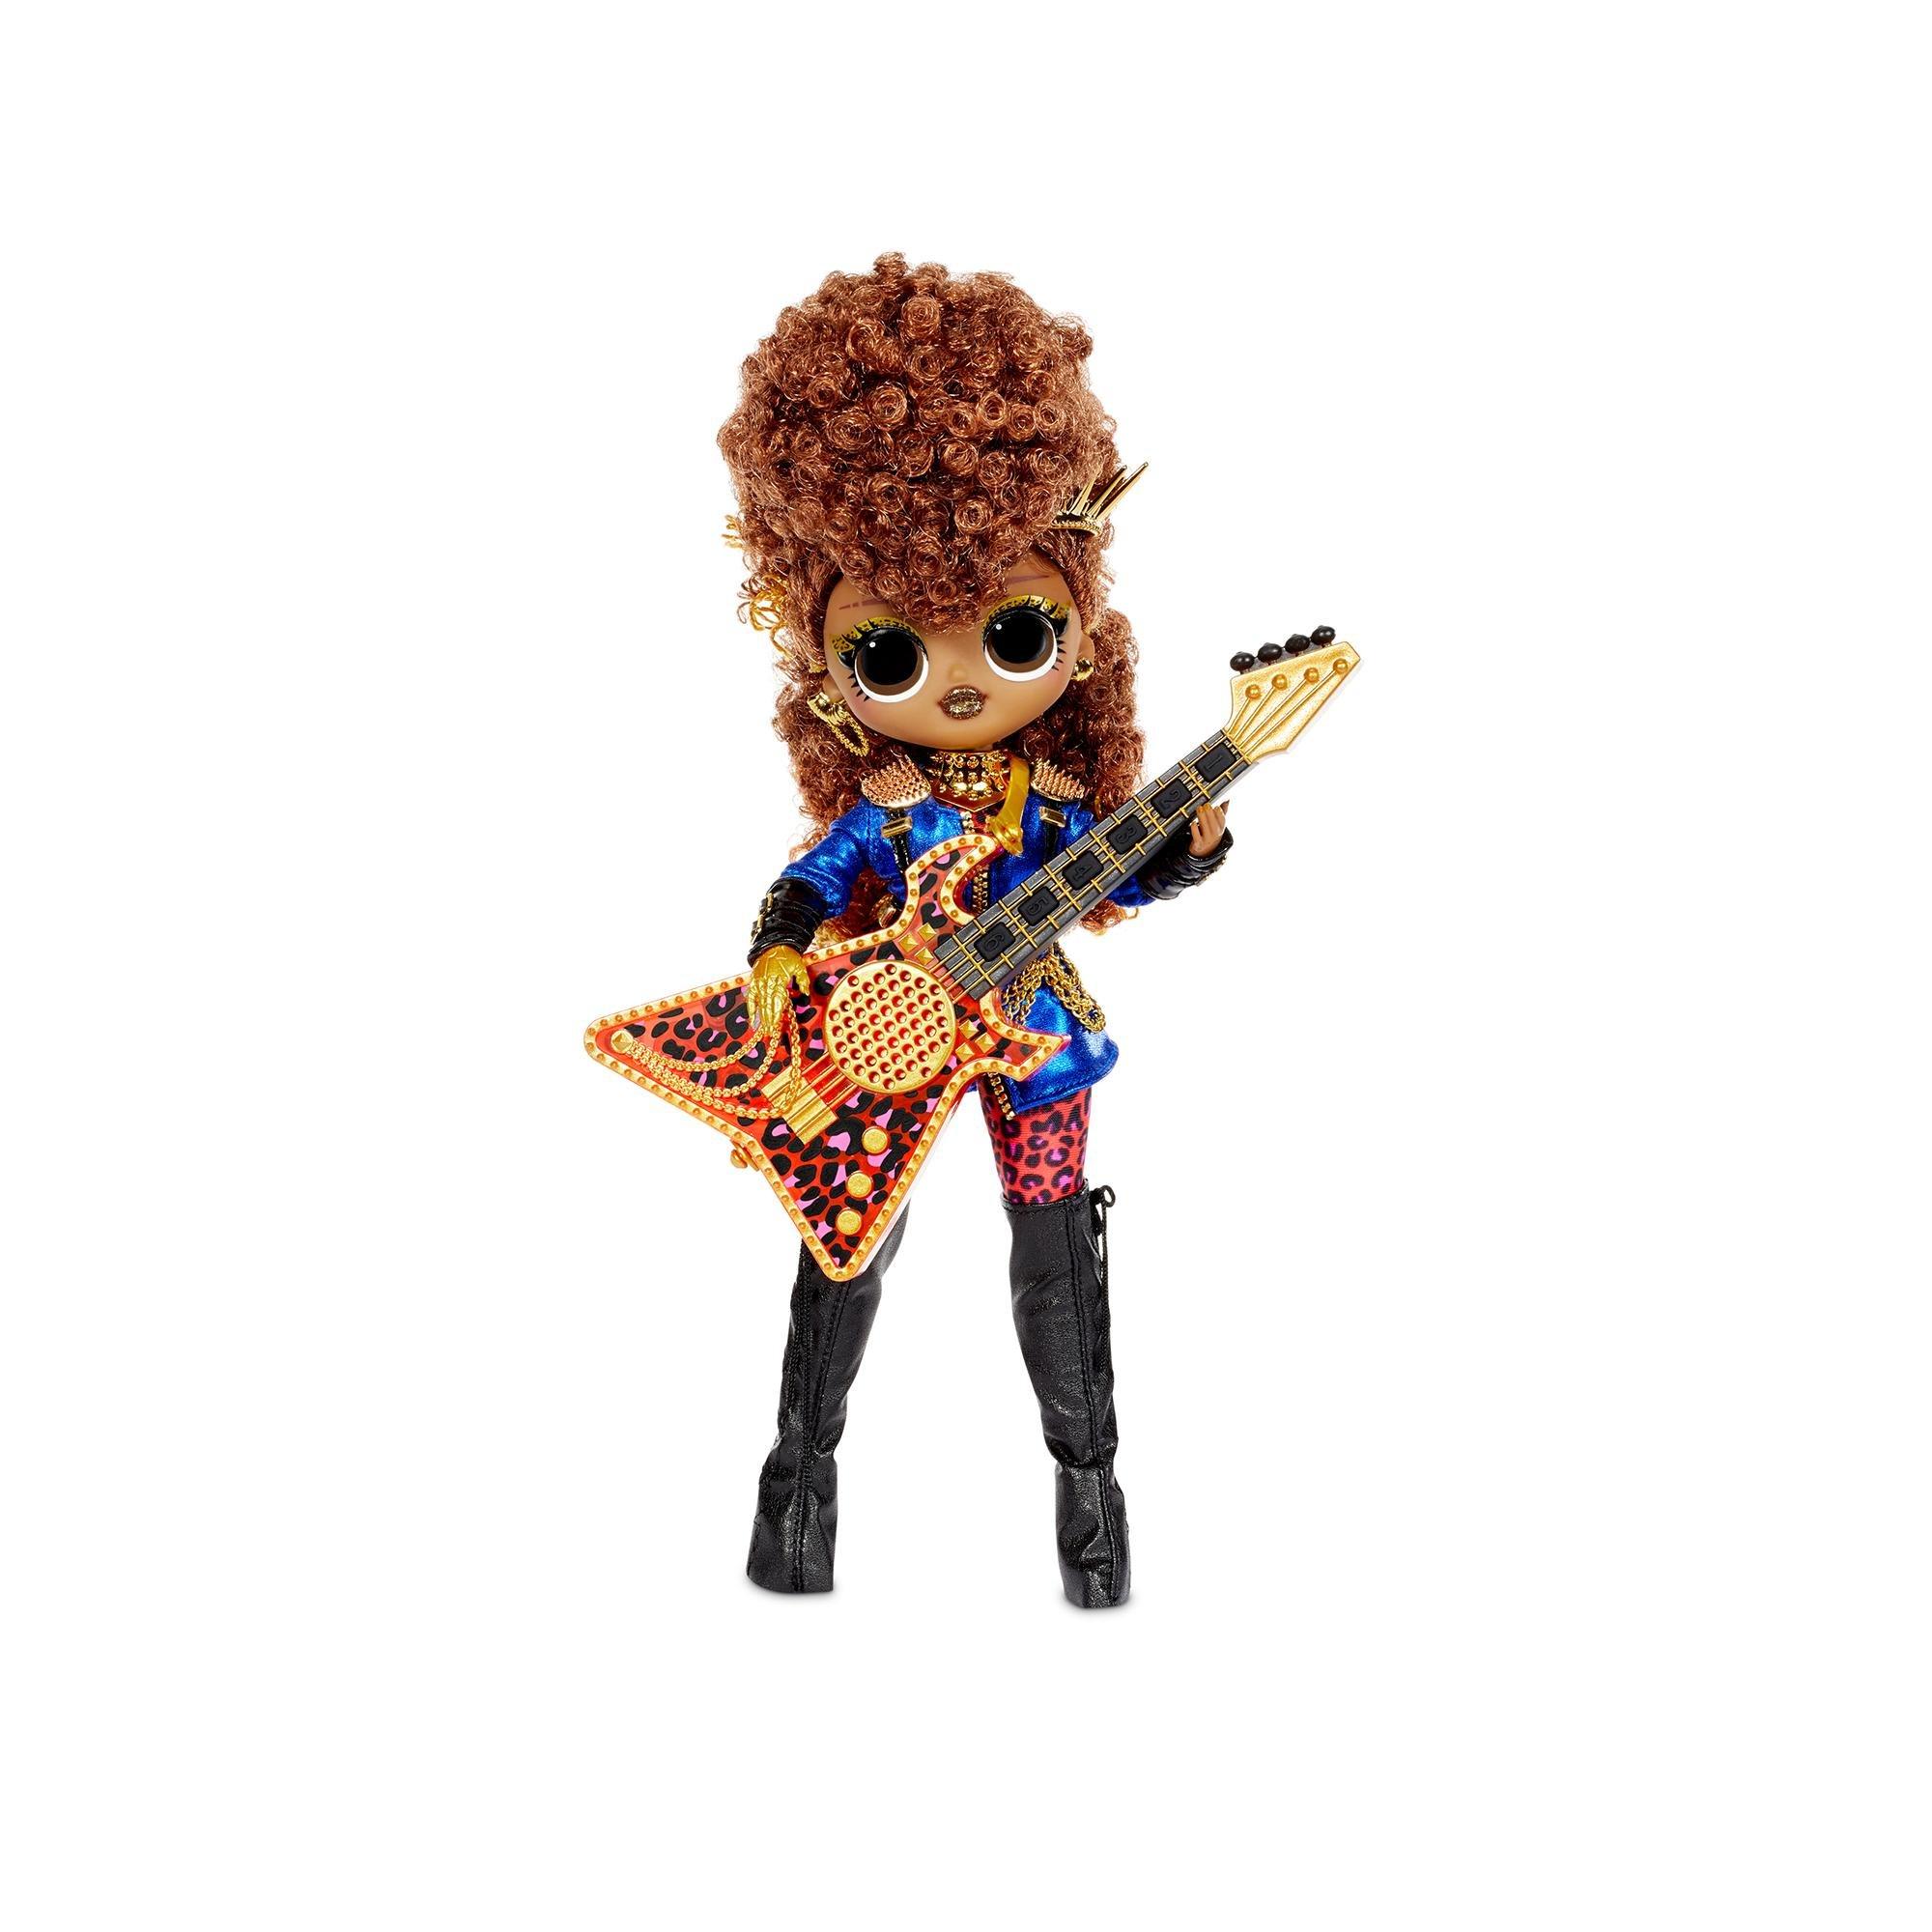 L.O.L. Surprise - OMG Remix Rock Doll - Ferocious and Bass Guitar